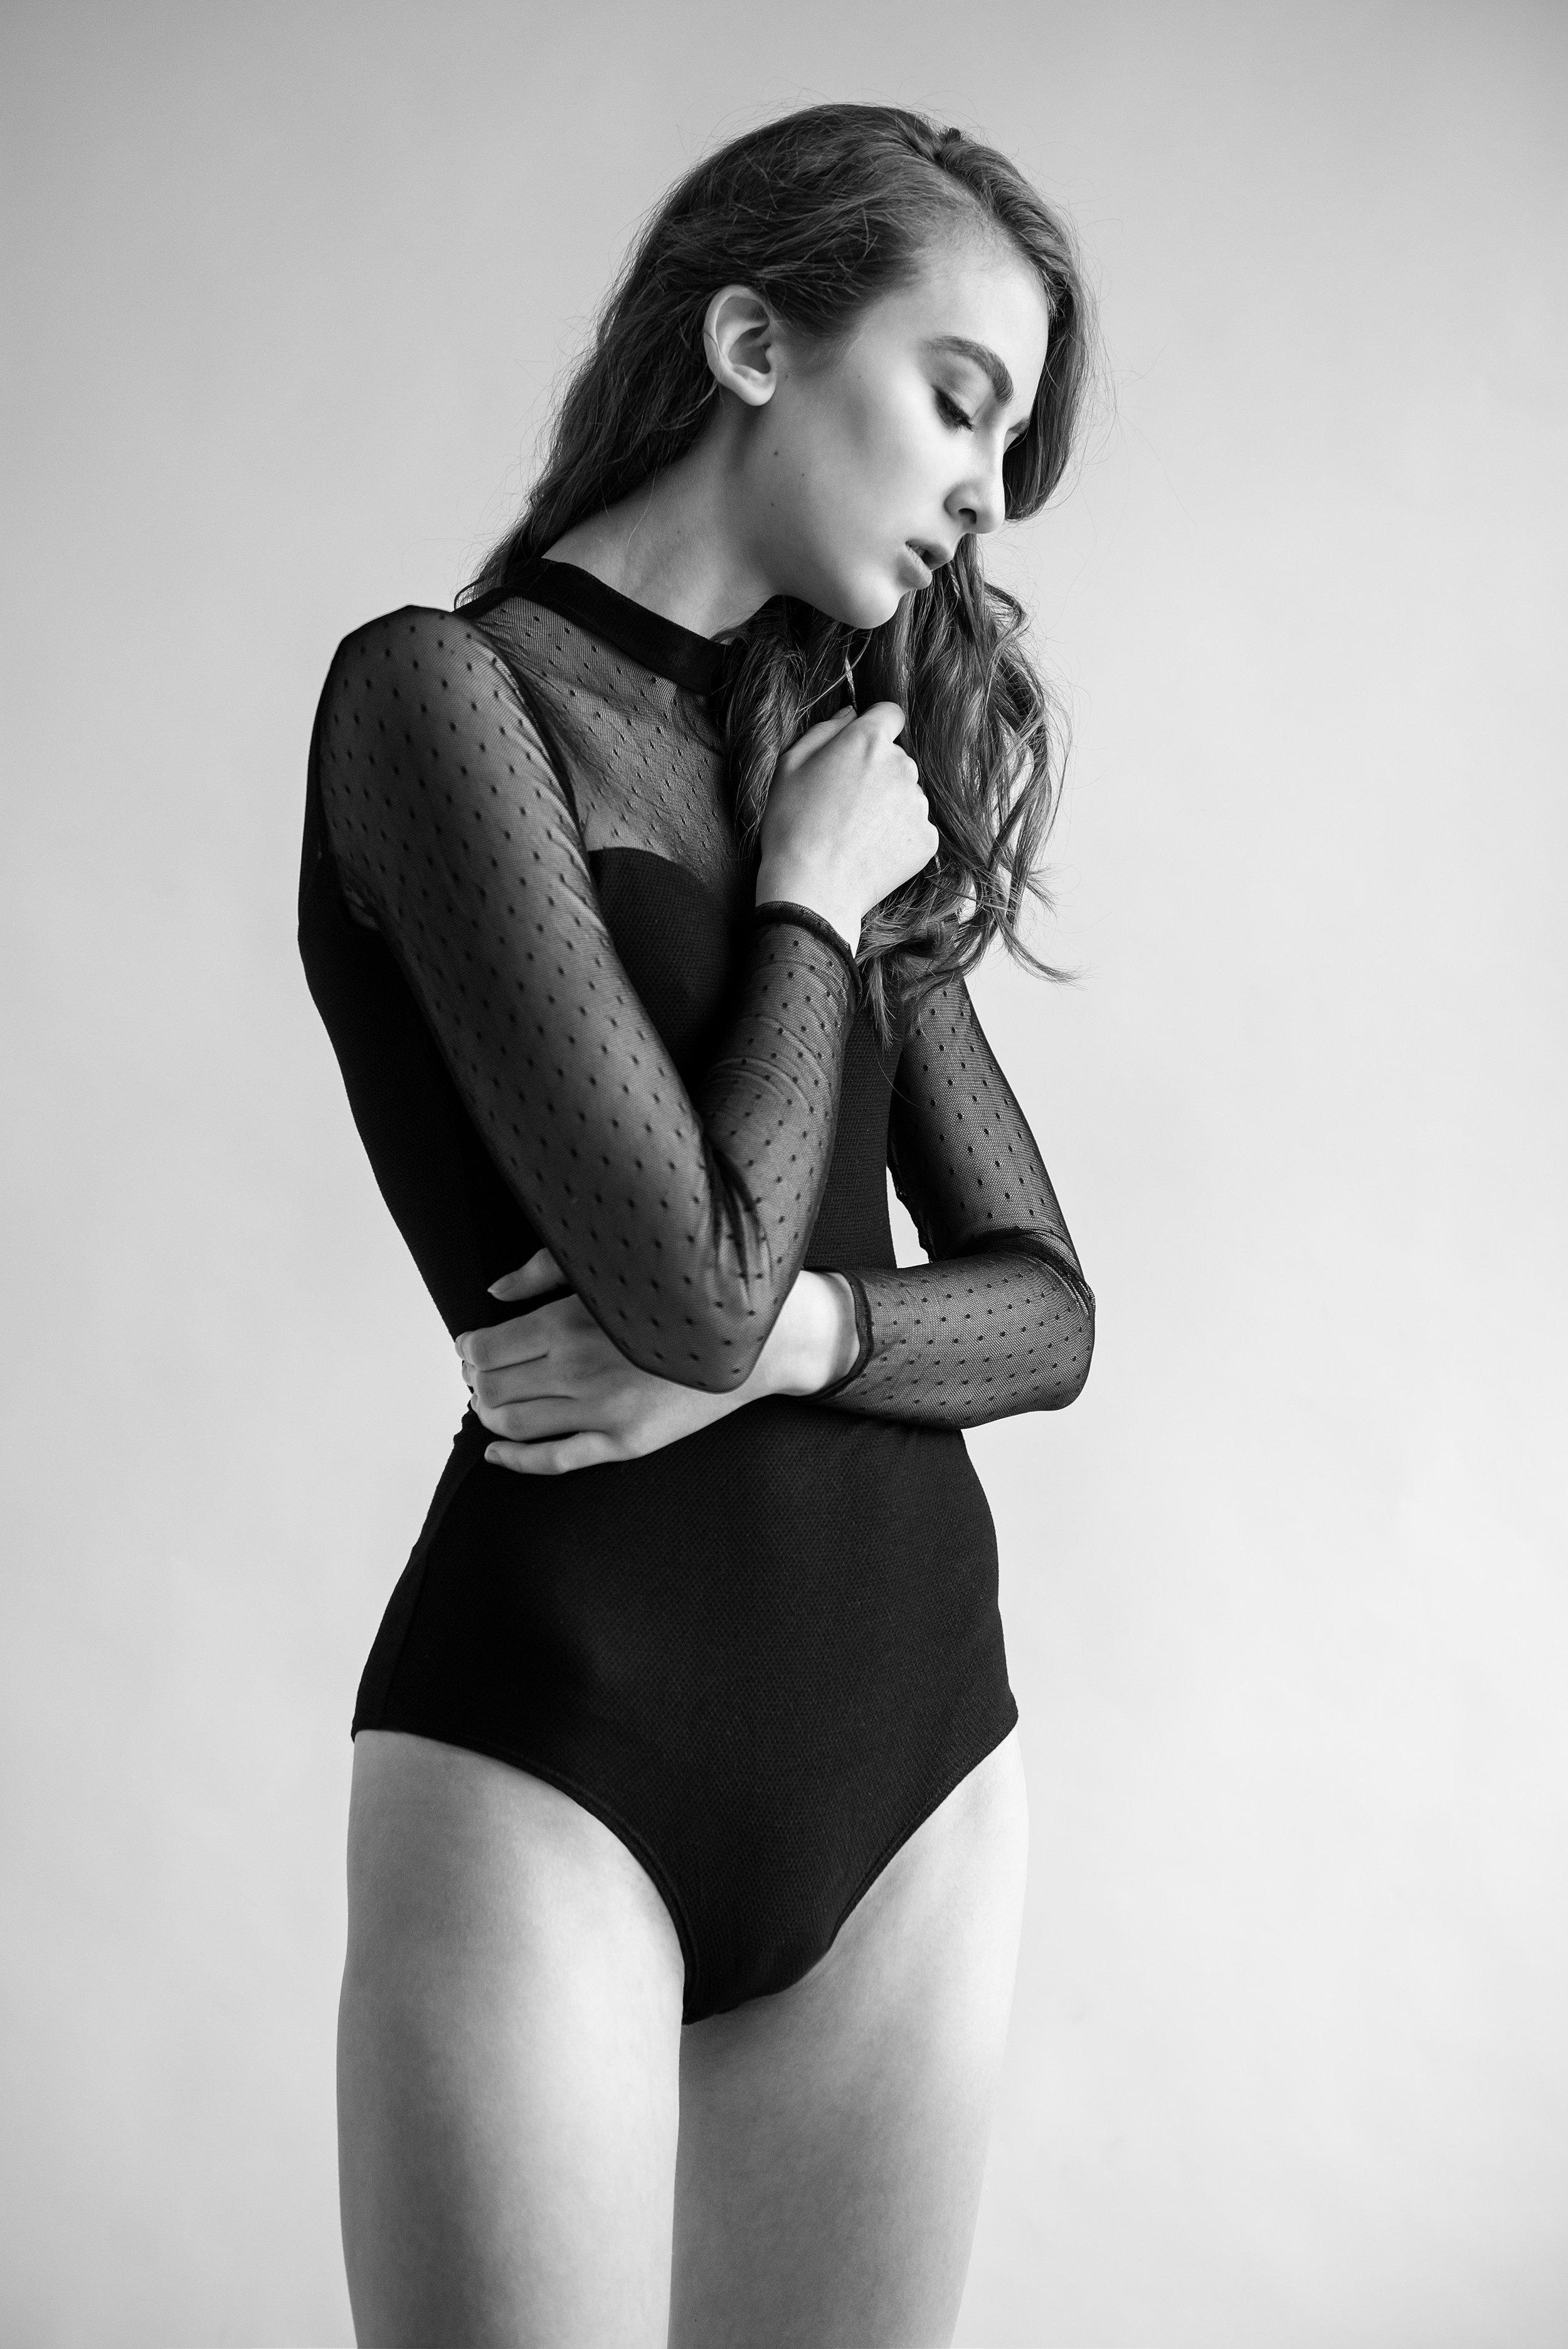 test_Karolina_RAVEN_Models_19_by_Szymon_Ratajczyk.jpg